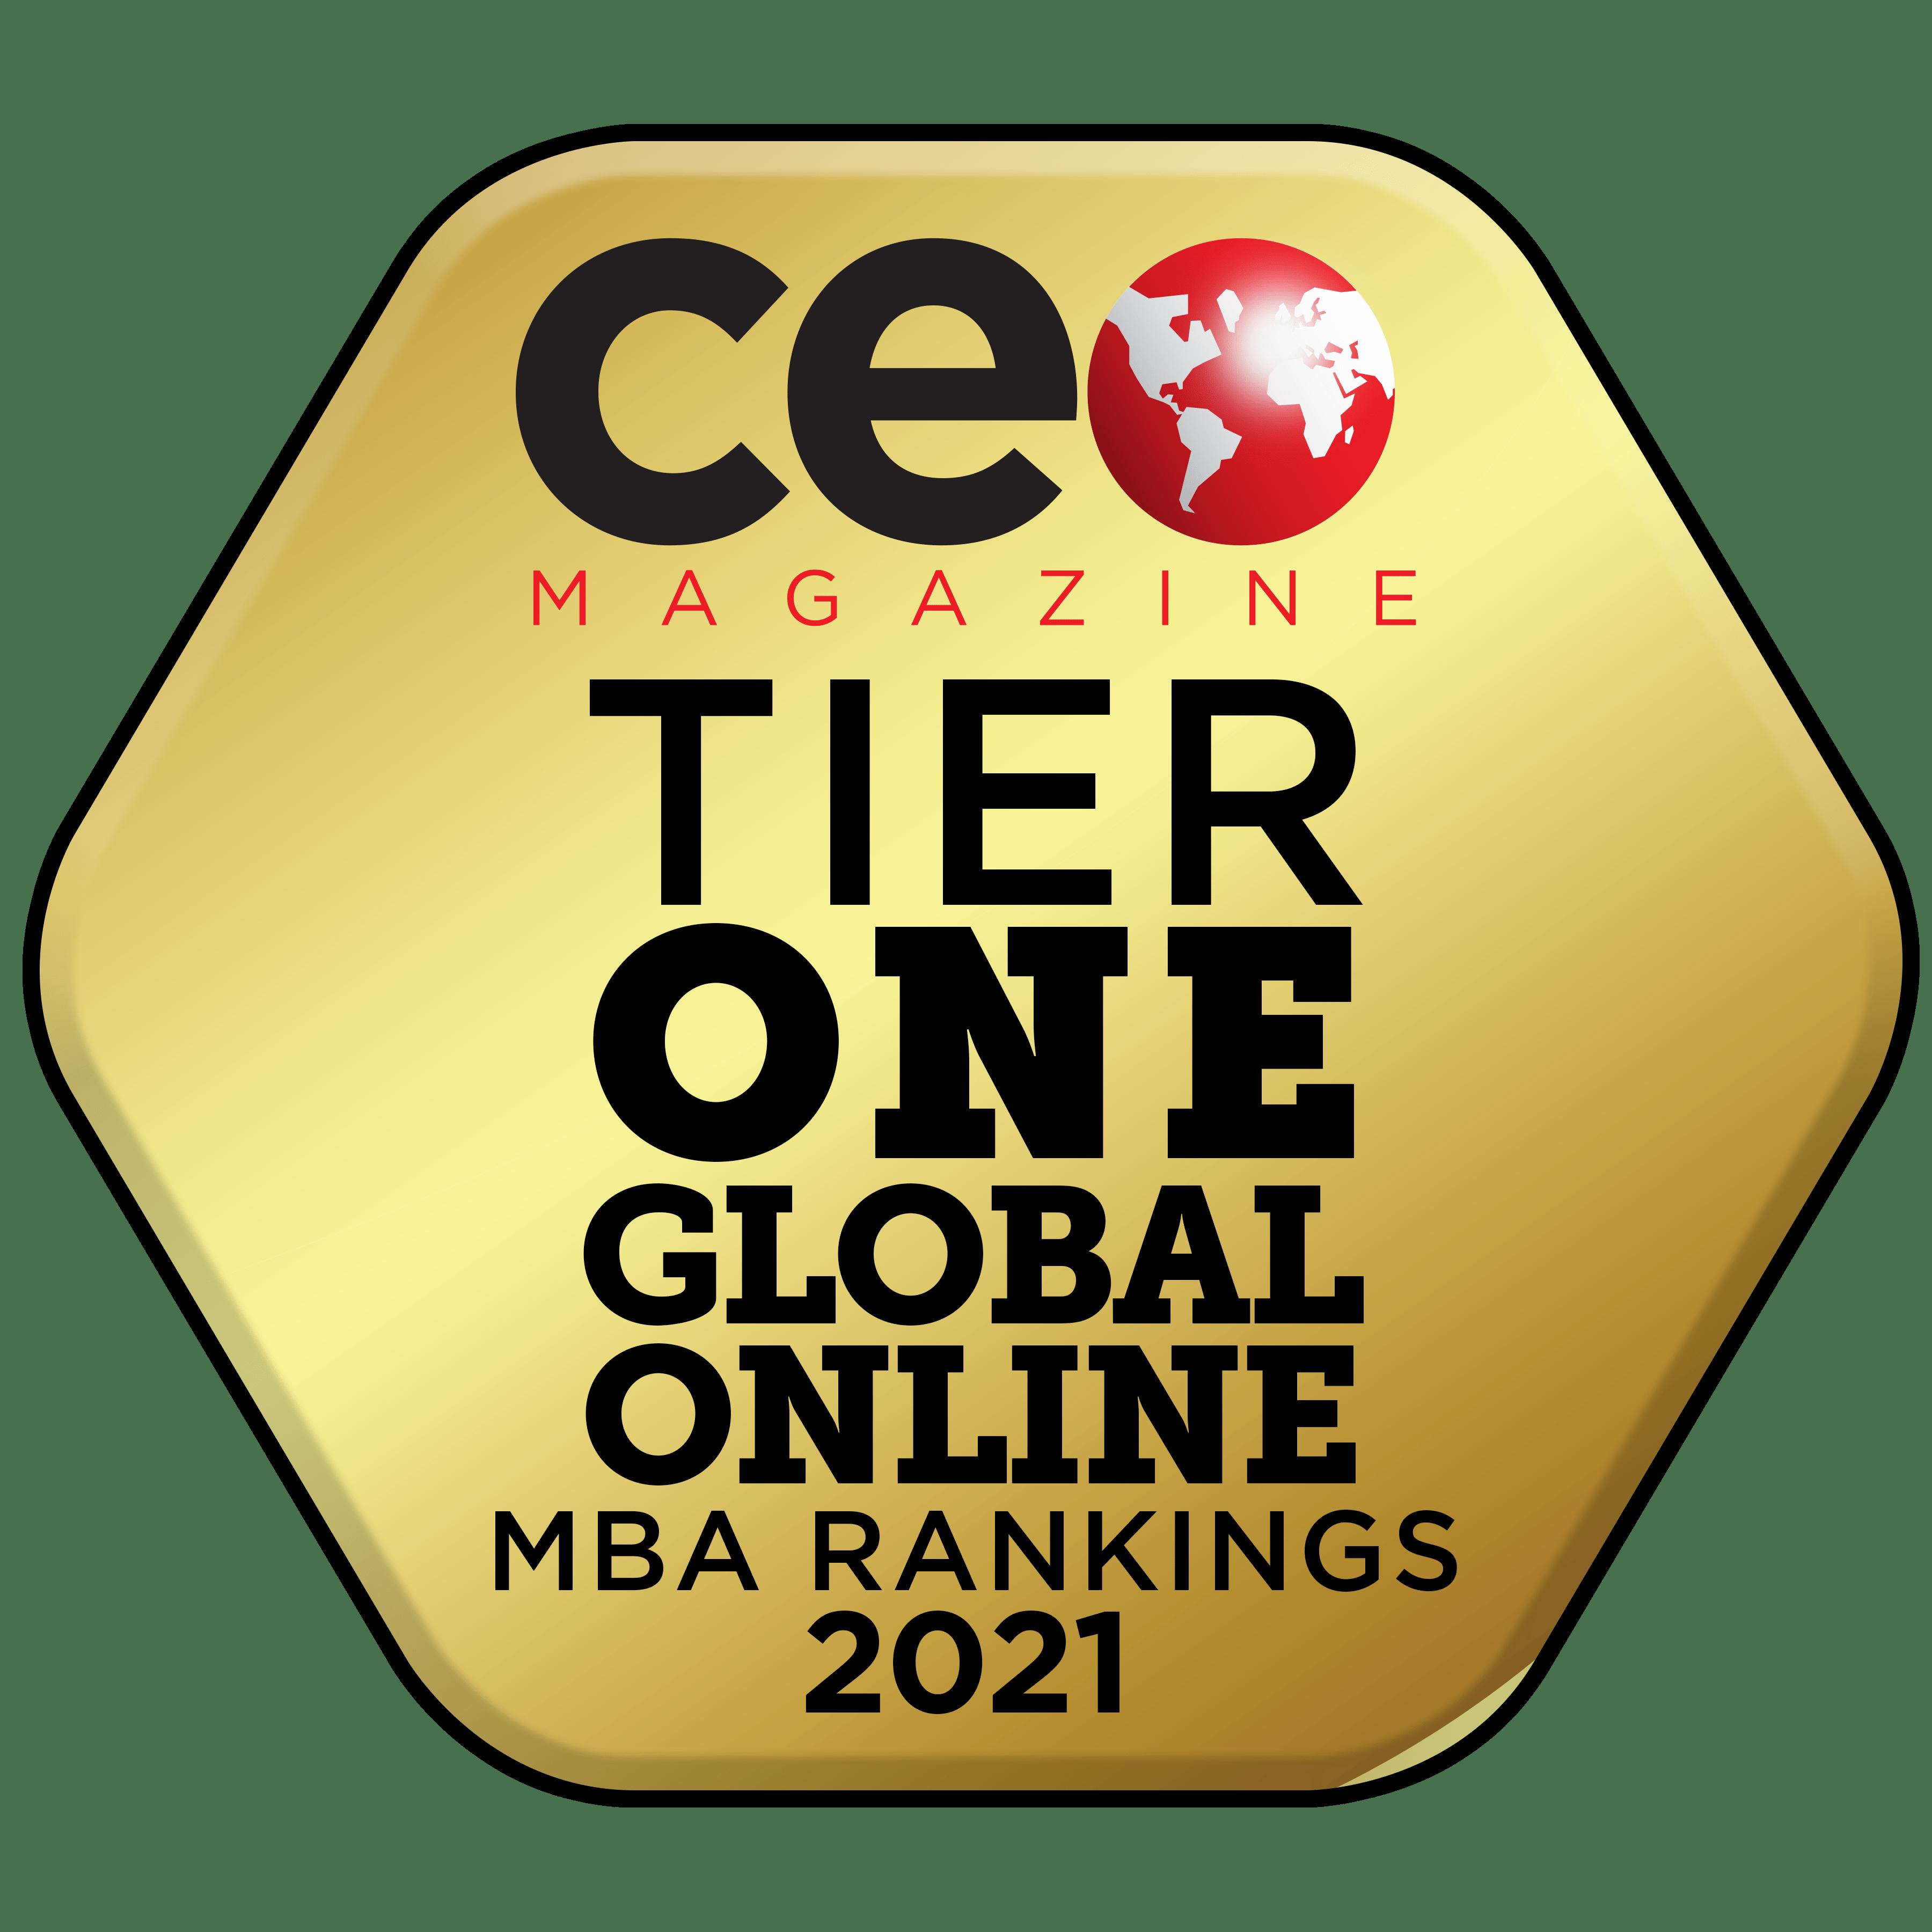 CEO Magazine 2021 Ranking